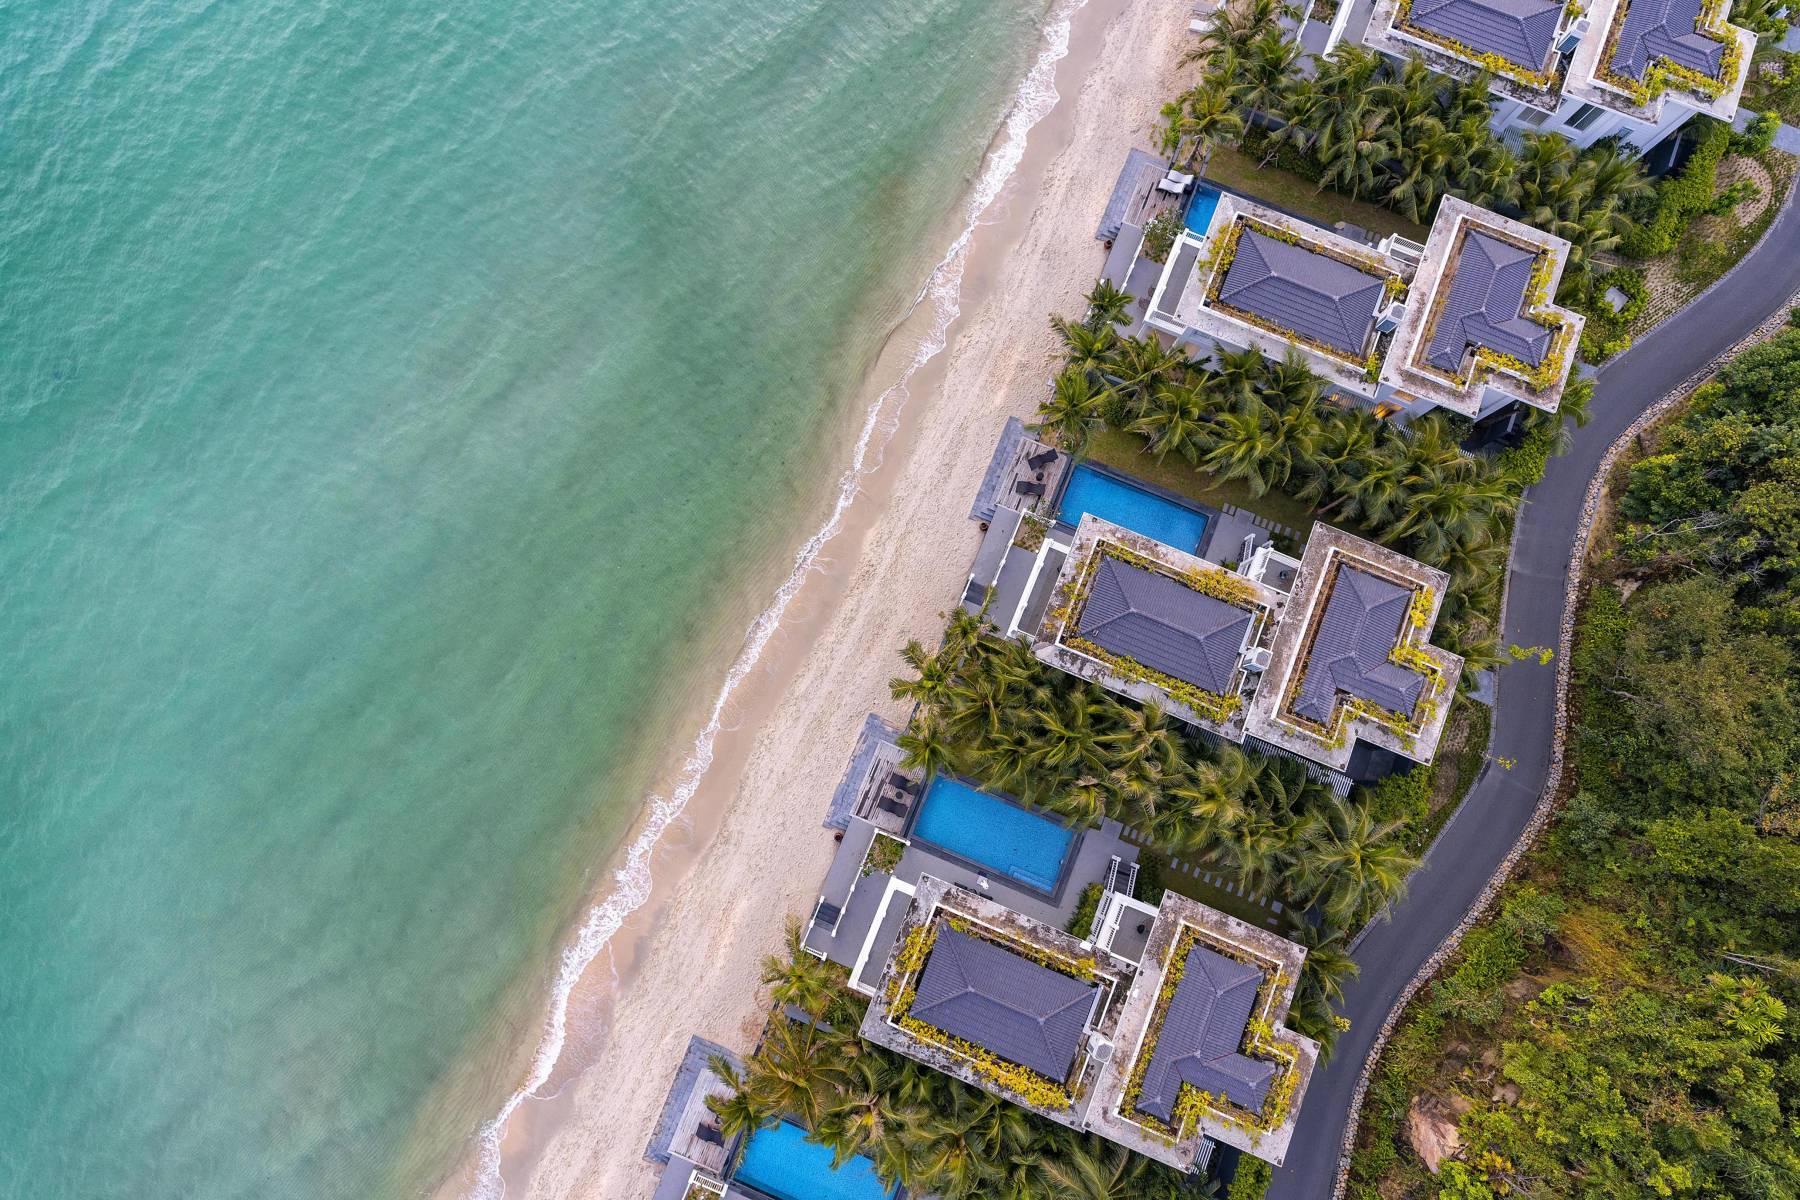 Voucher Premier Village Phú Quốc tiêu chuẩn 5 sao